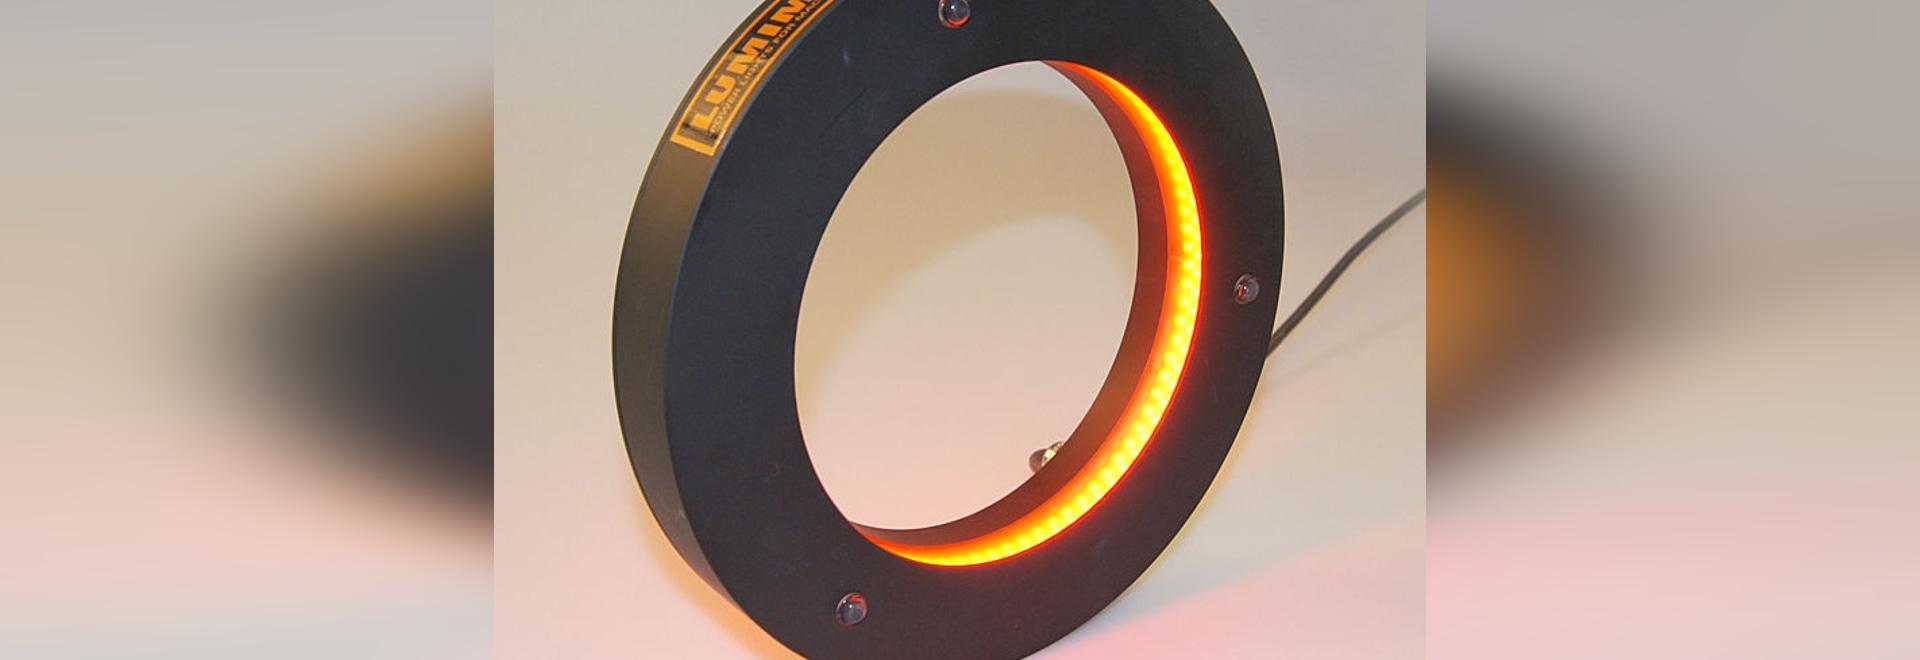 LED Dark field lights from LUMIMAX®